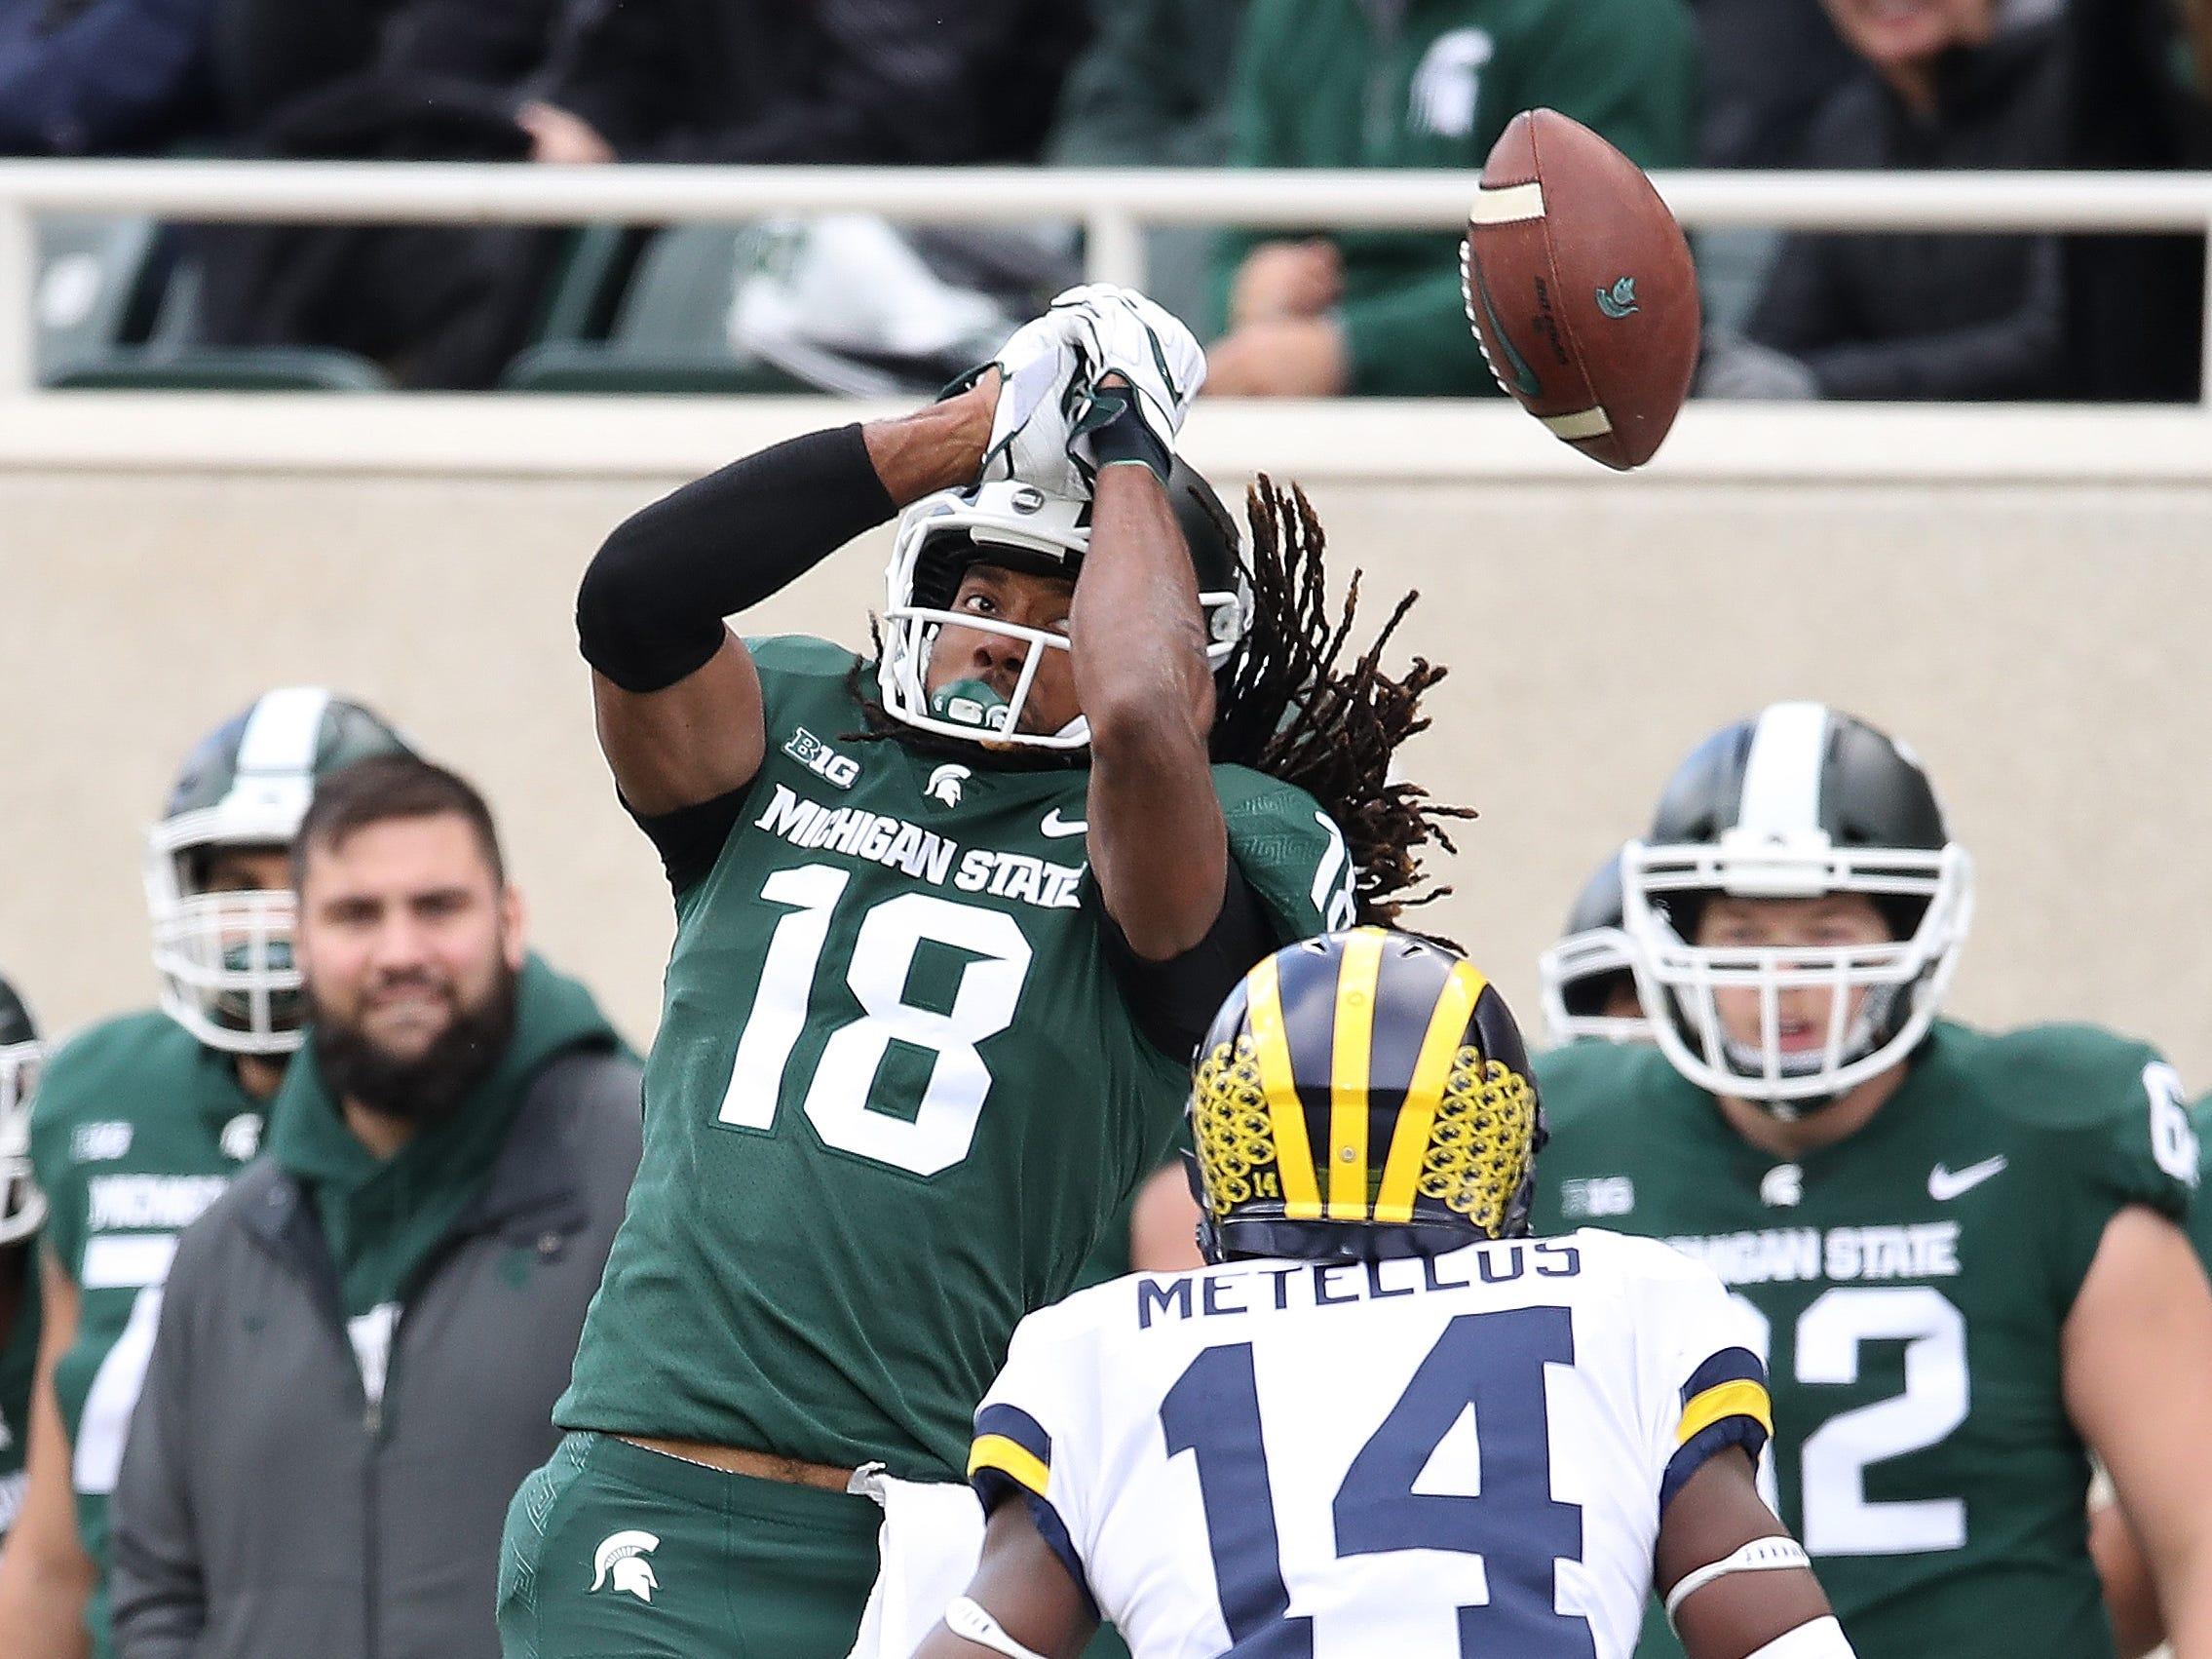 Michigan State's Felton Davis III can't make a first-quarter catch next to Michigan's Josh Metellus at Spartan Stadium on Oct. 20, 2018 in East Lansing.